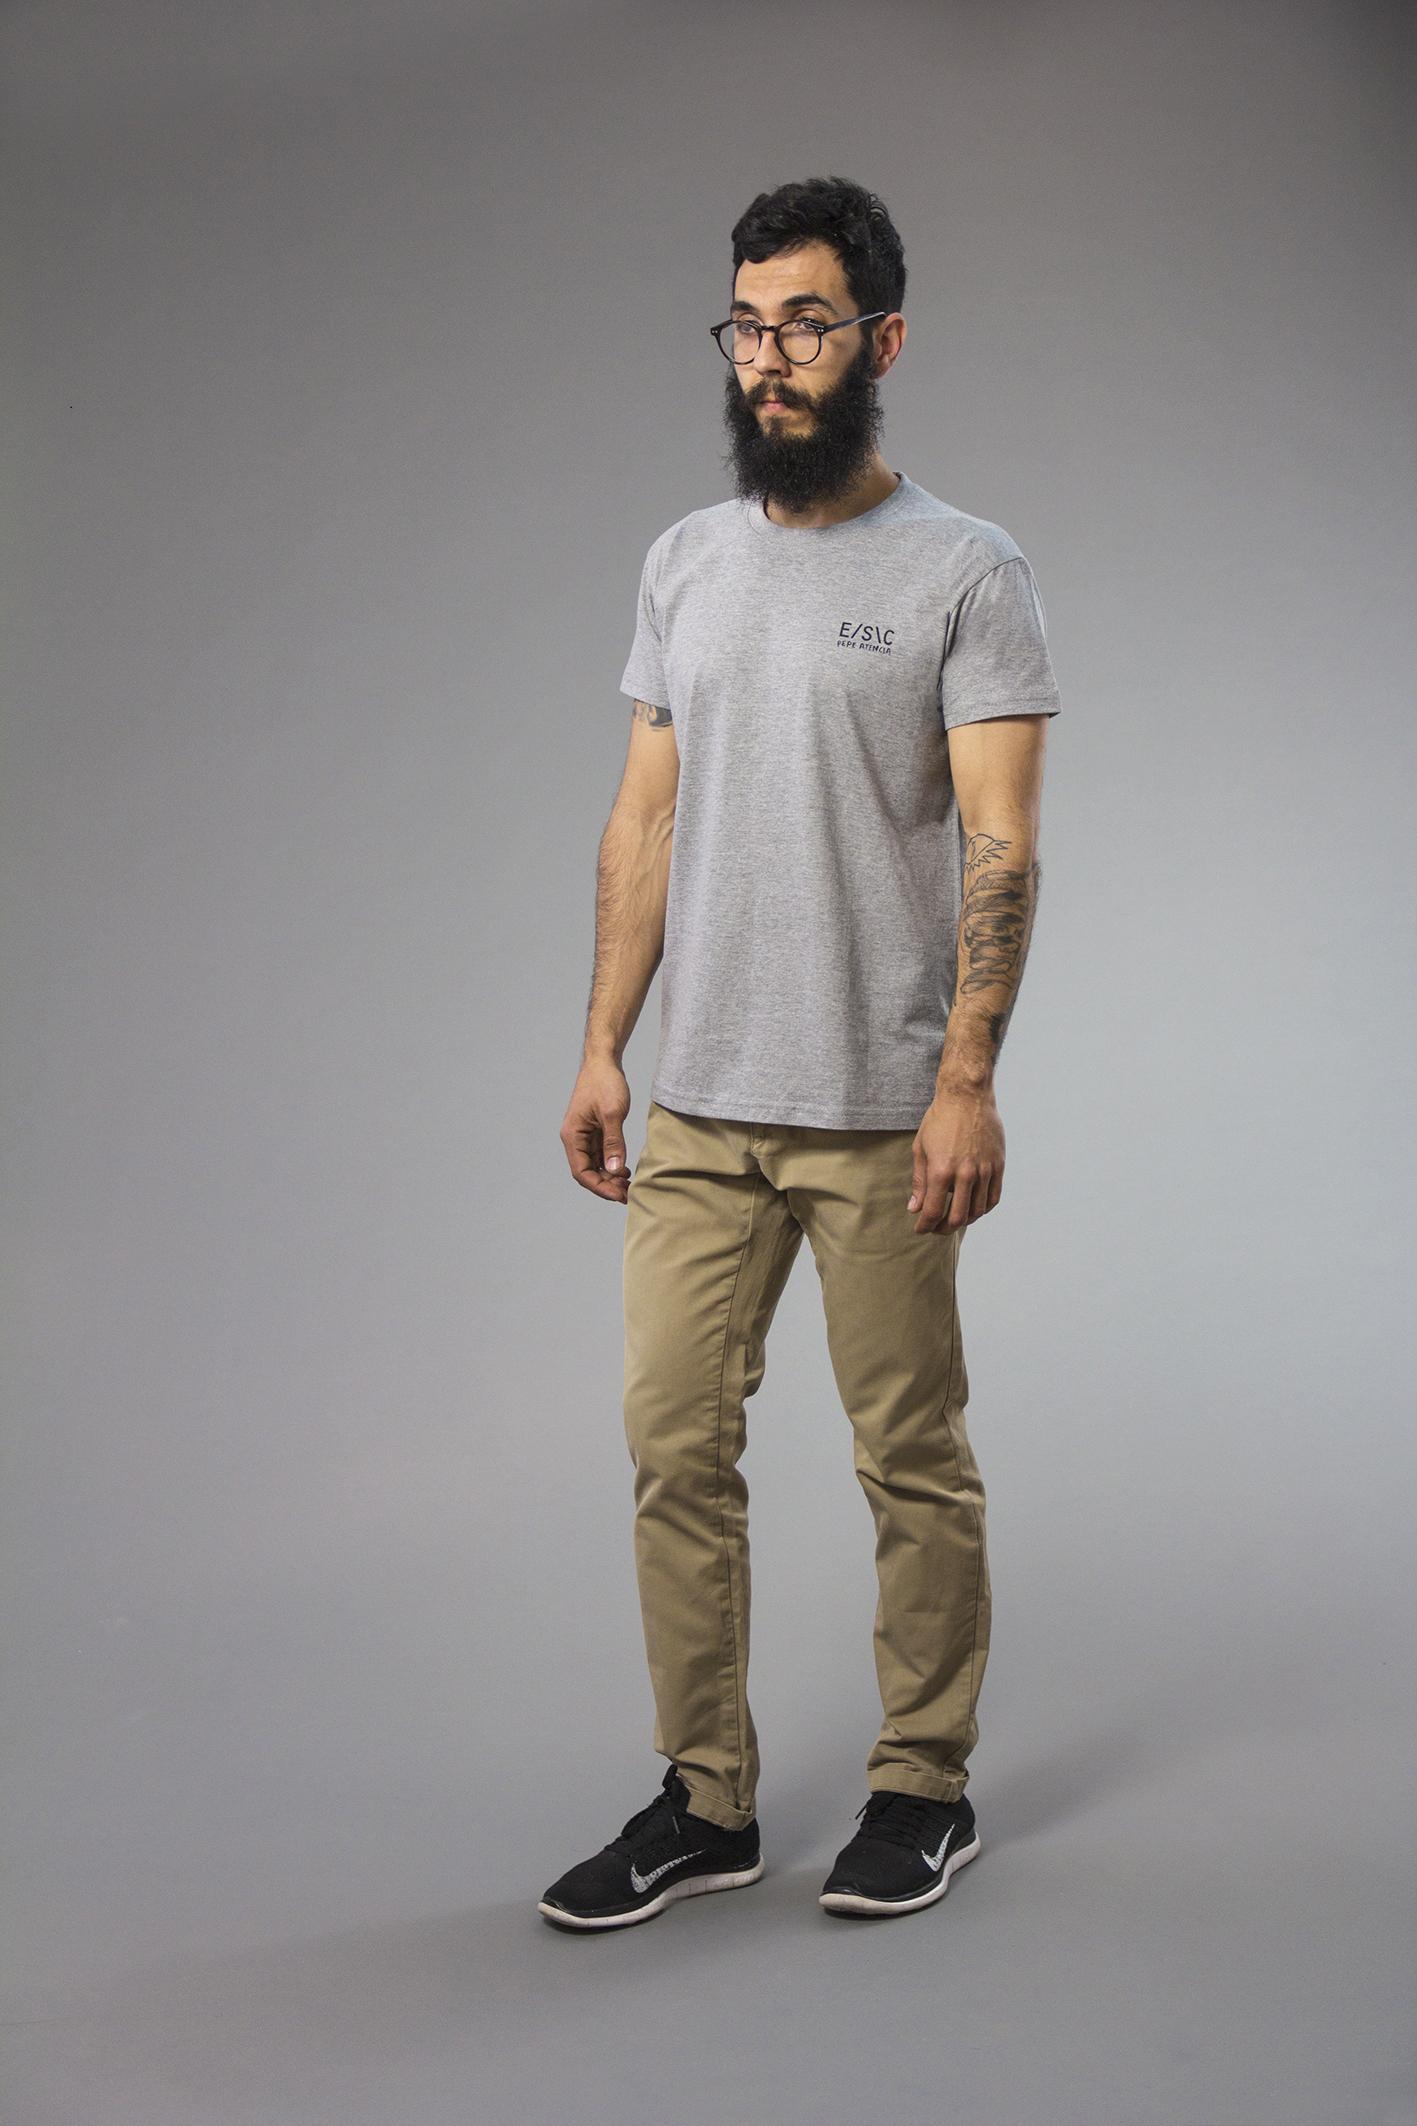 Tshirt_F.coppi_03_g.jpg